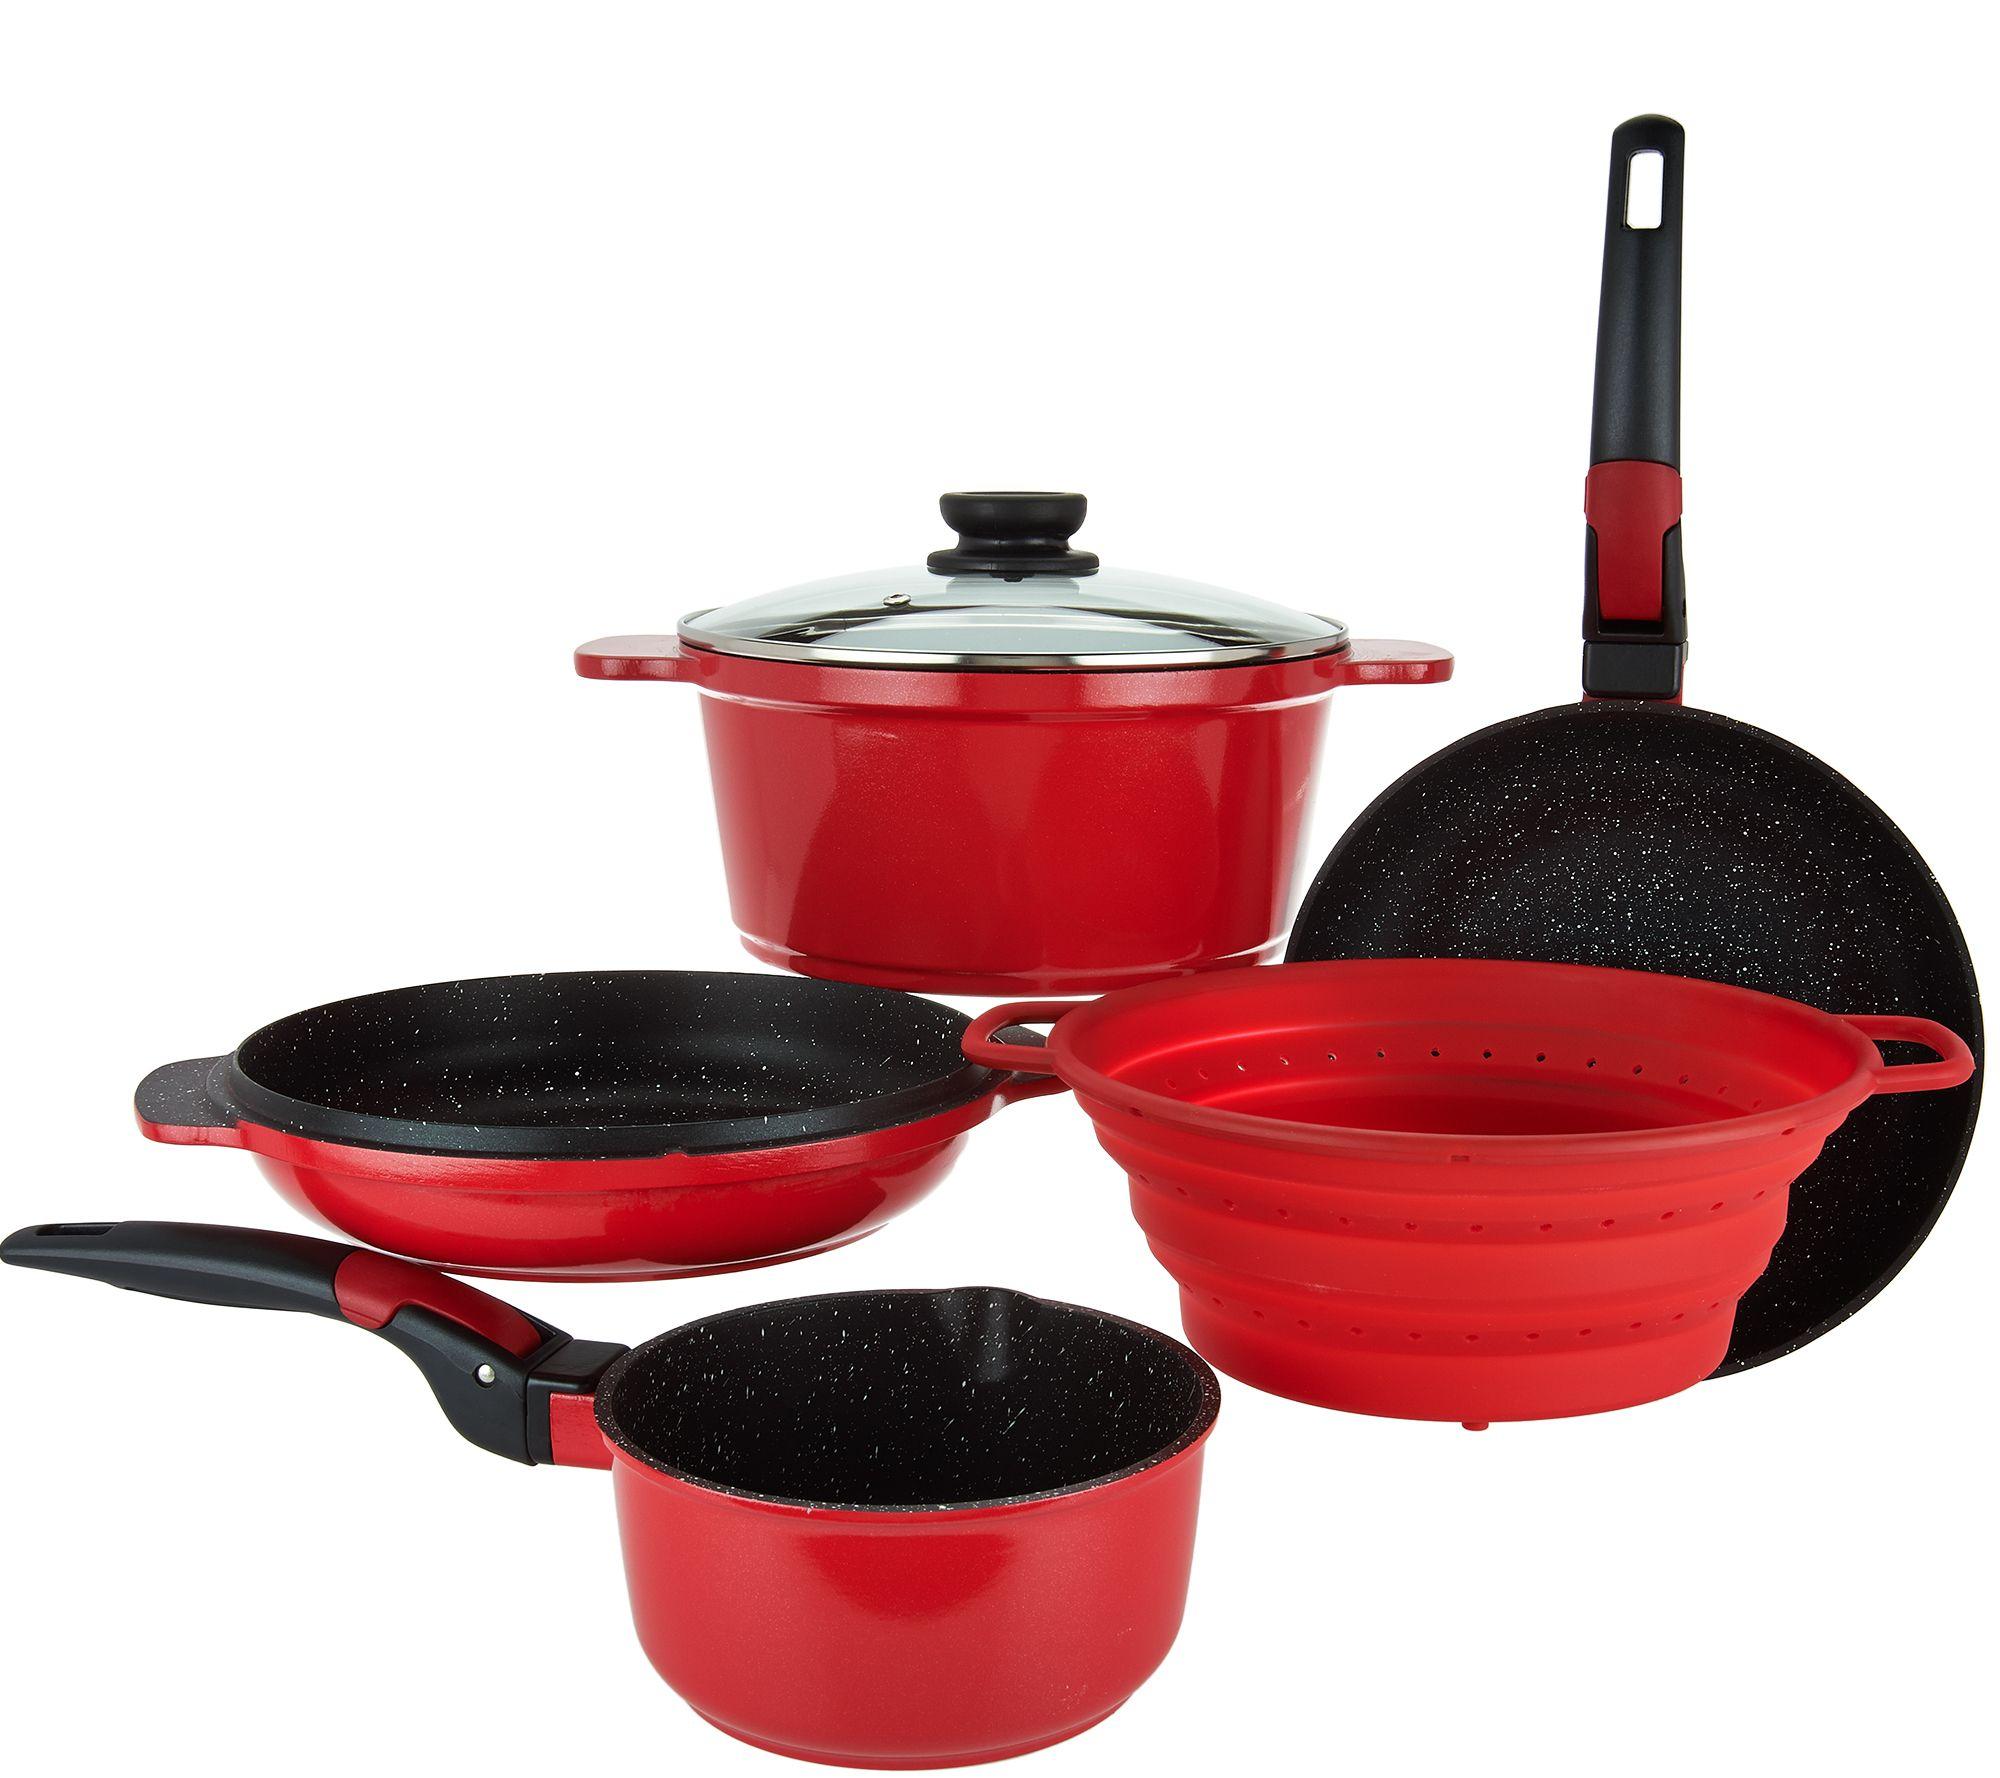 Cooks Essentials Kitchenware — Kitchen & Food — QVC.com